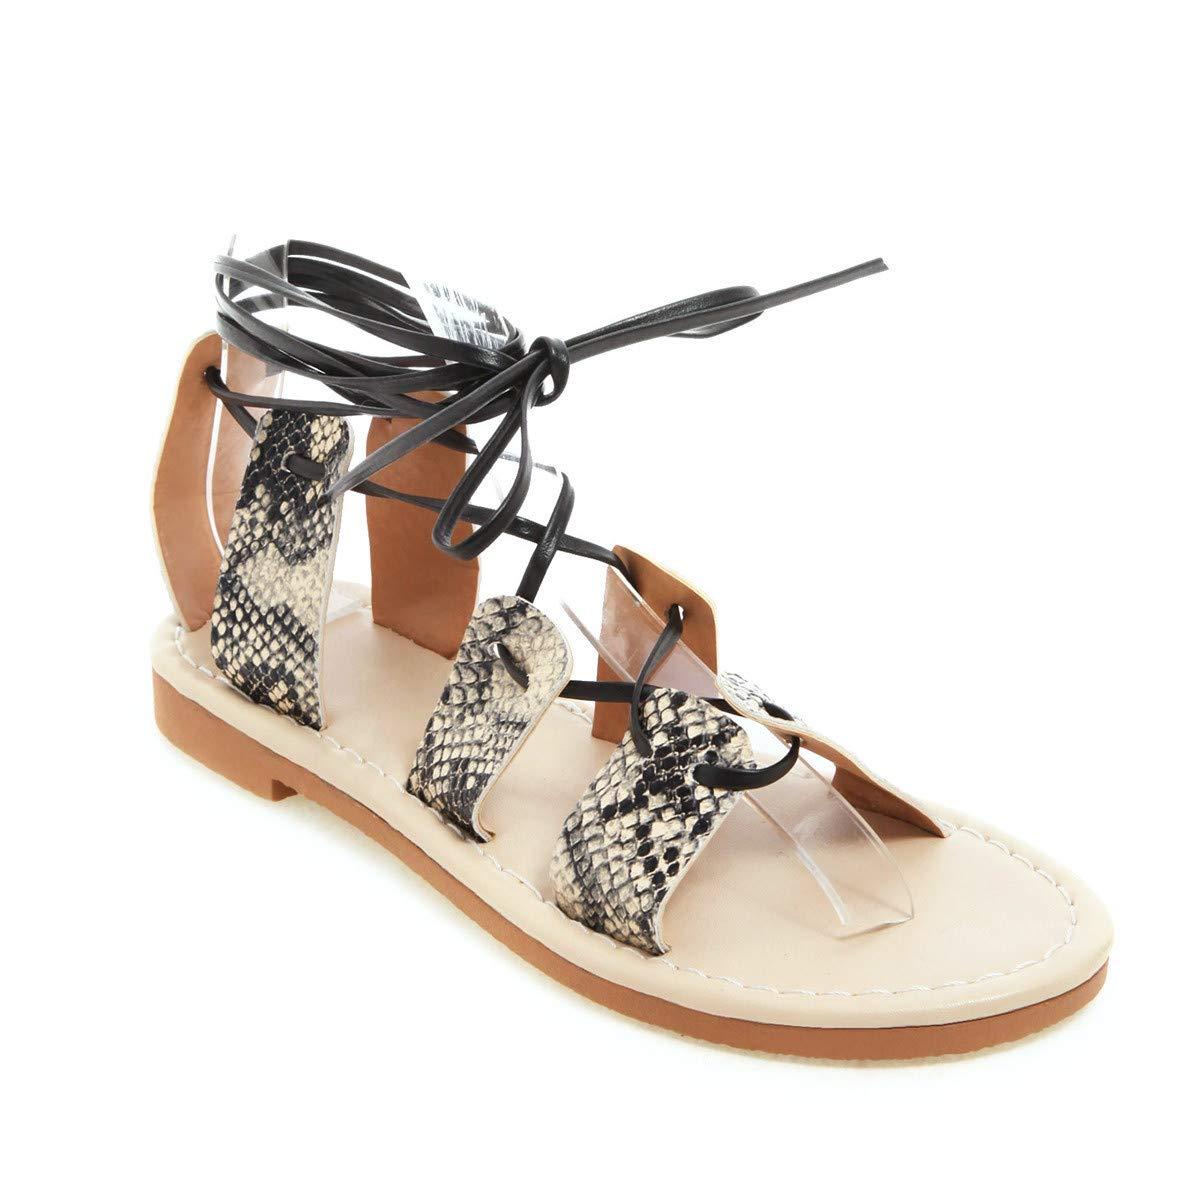 Hot Summer Cutout Lace Up Flats Leg Wrap Rome Sandals Open Toe Ankle-Cross Summer Beach Shoes (Yellow, 5)